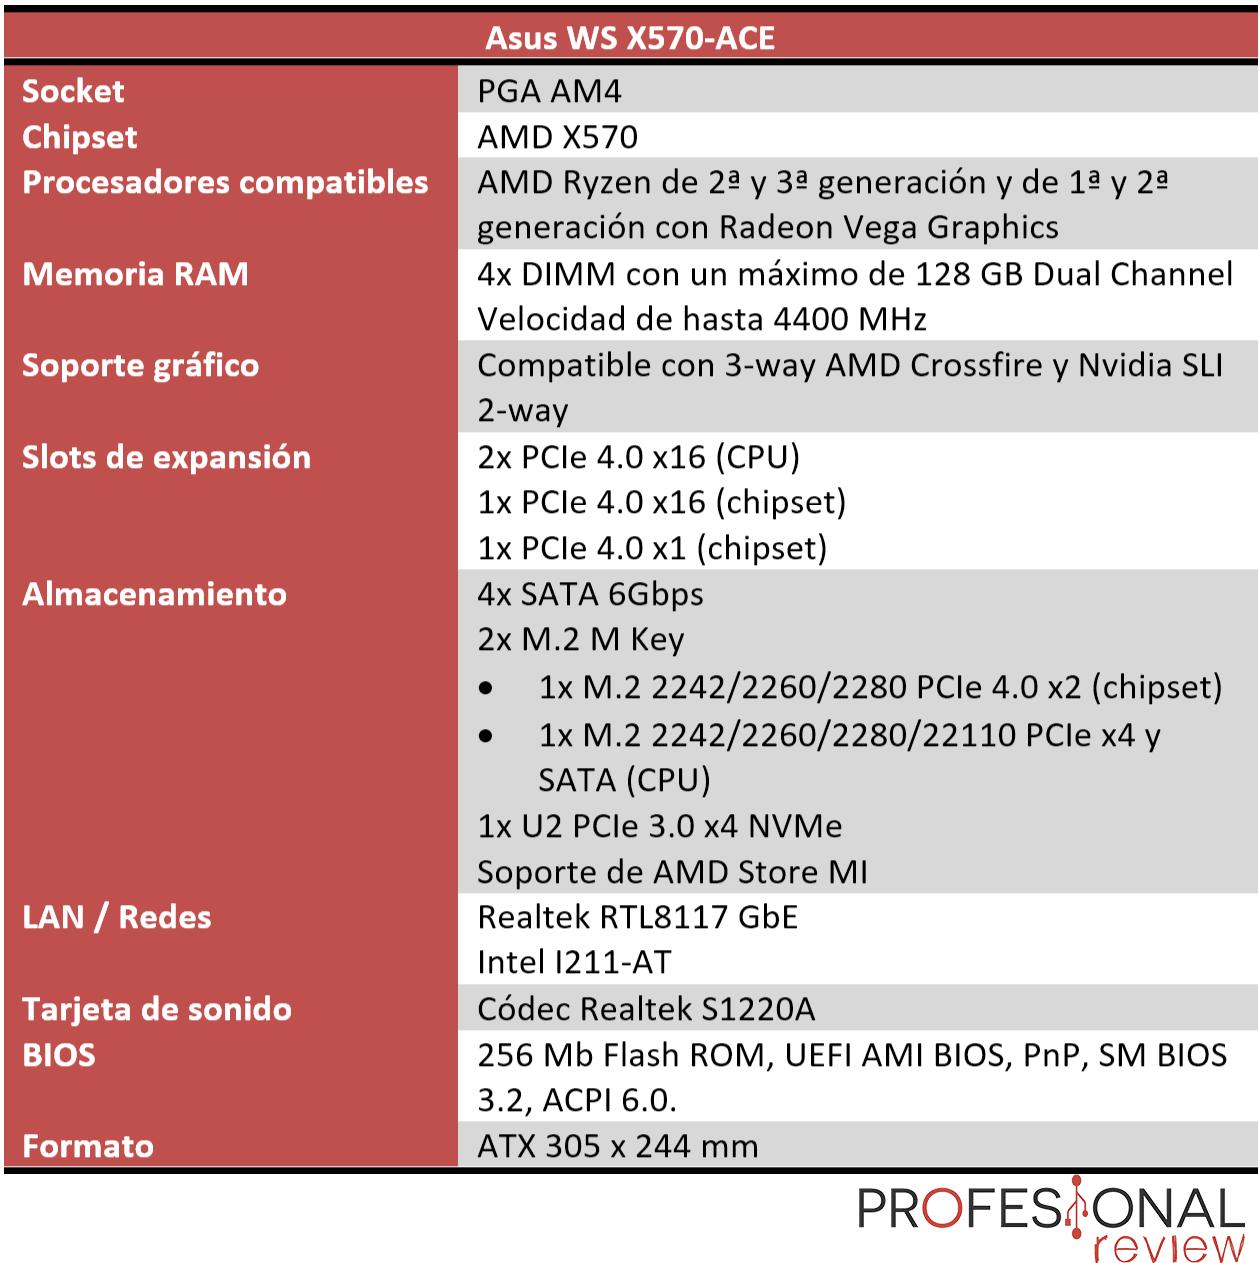 Asus WS X570-ACE características